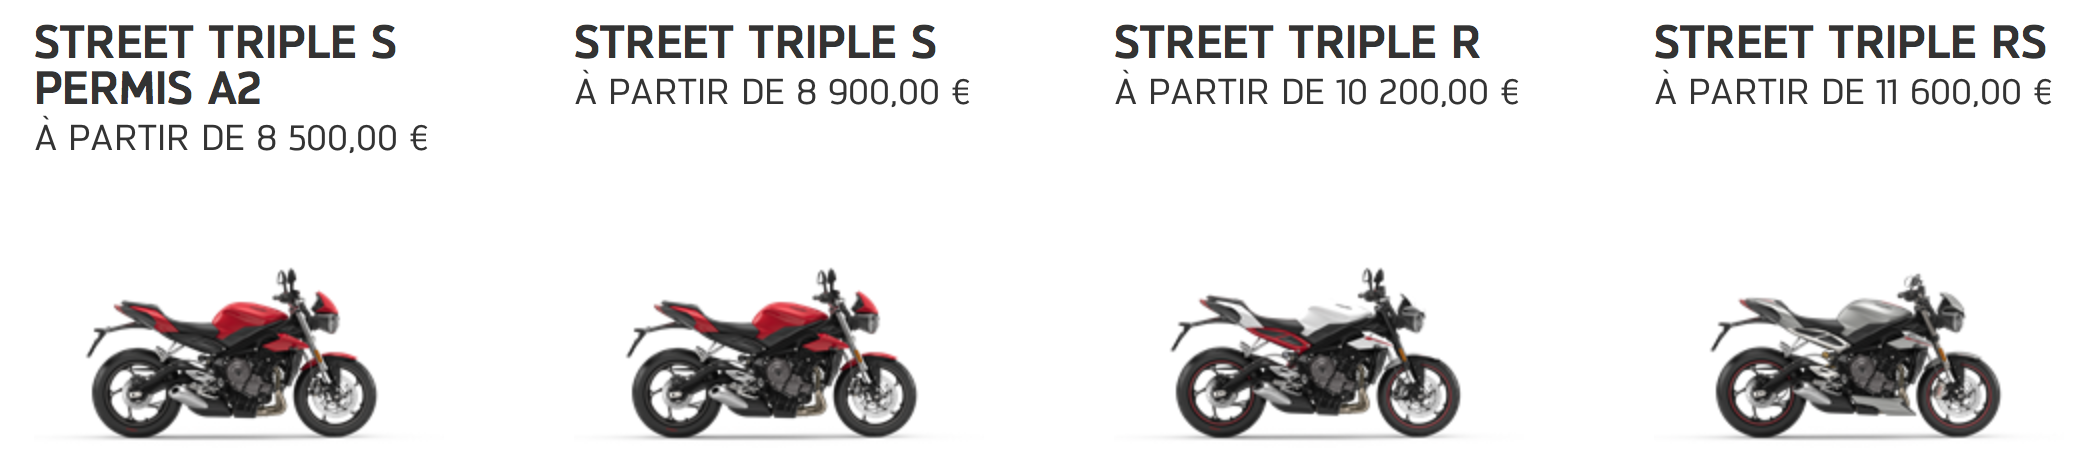 Comparatif gamme Street Triple 2017